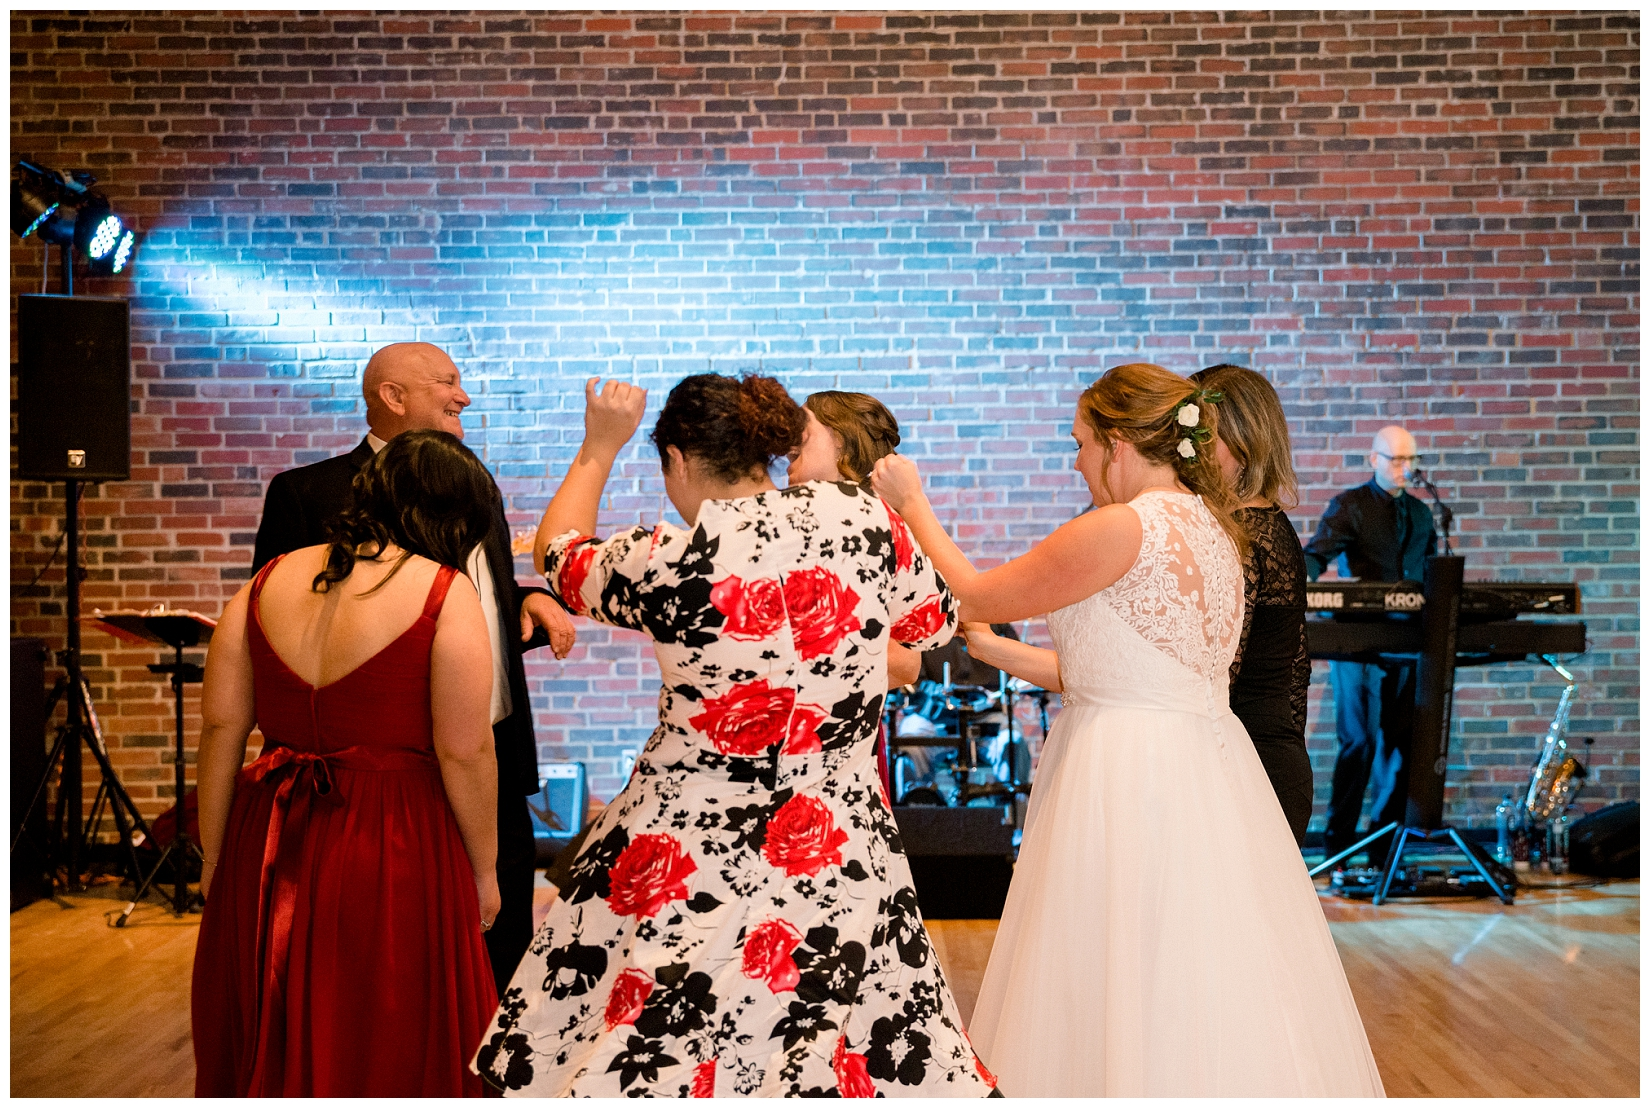 cat-alkire-wedding-photographer-indiana-chicago-indianapolis-fort-wayne_1007.jpg